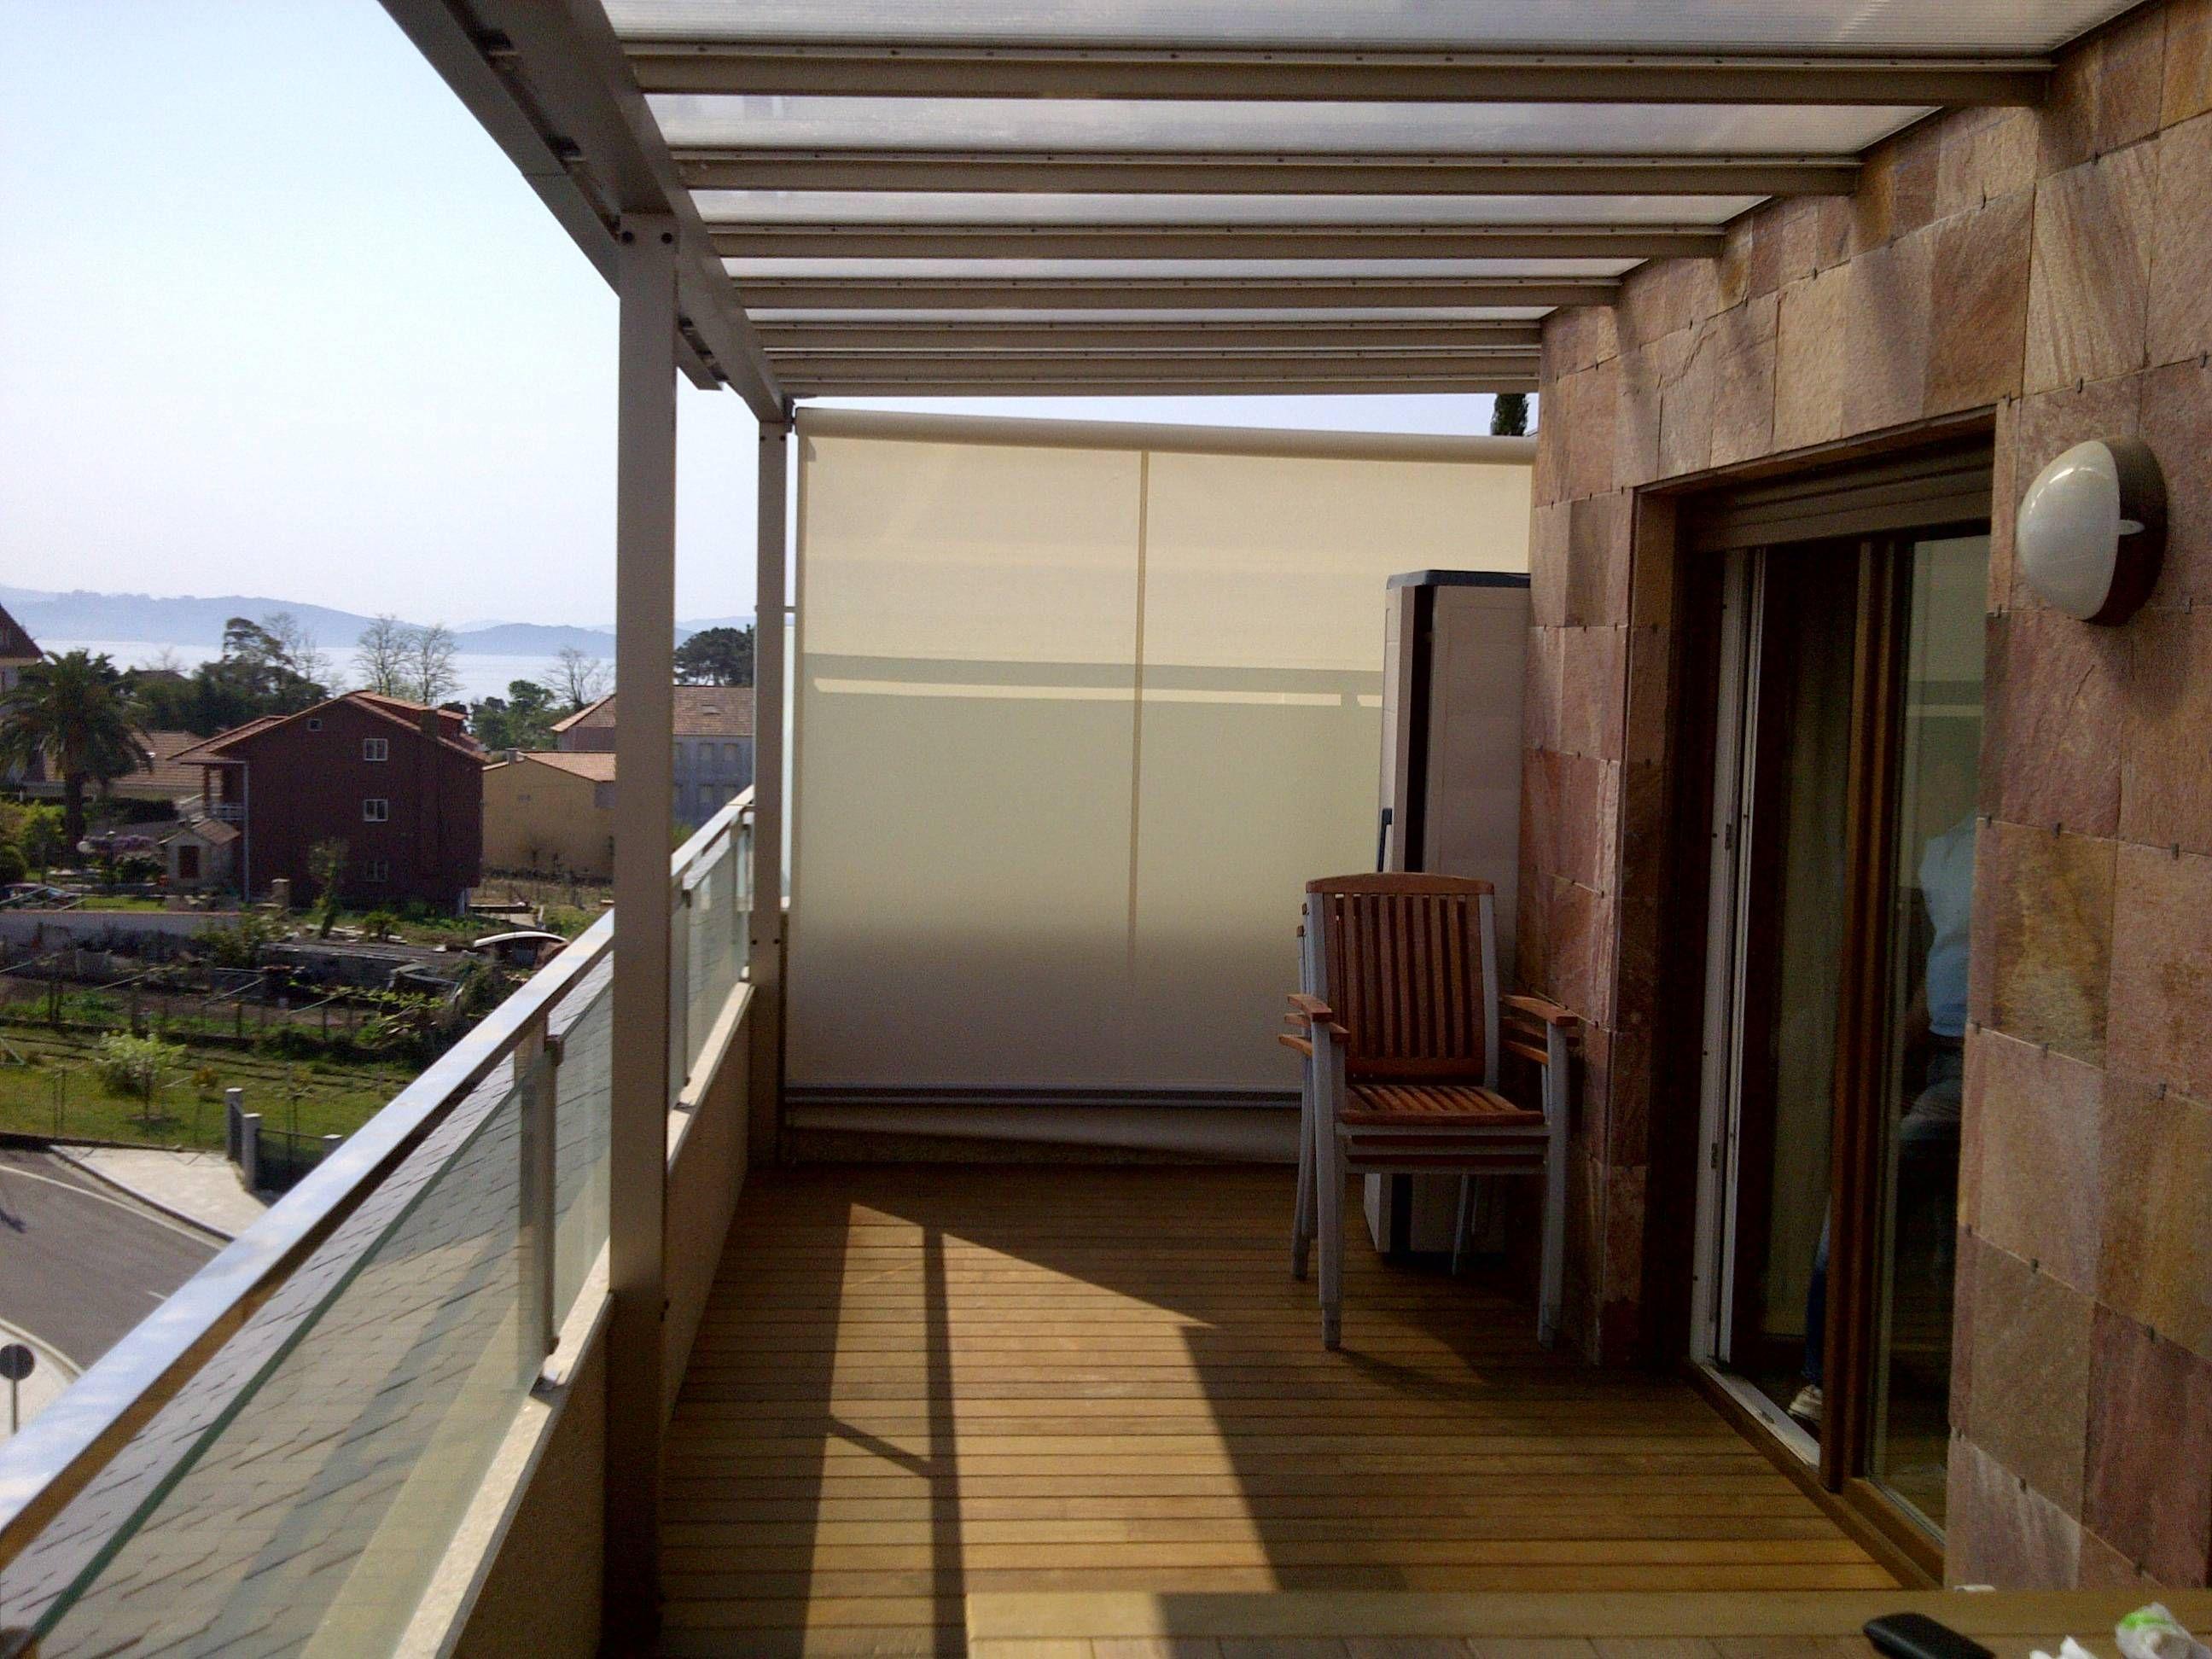 Toldo lateral cortavientos en terraza sistemas de protecci n solar toldo cofre toldo - Toldos para aticos ...